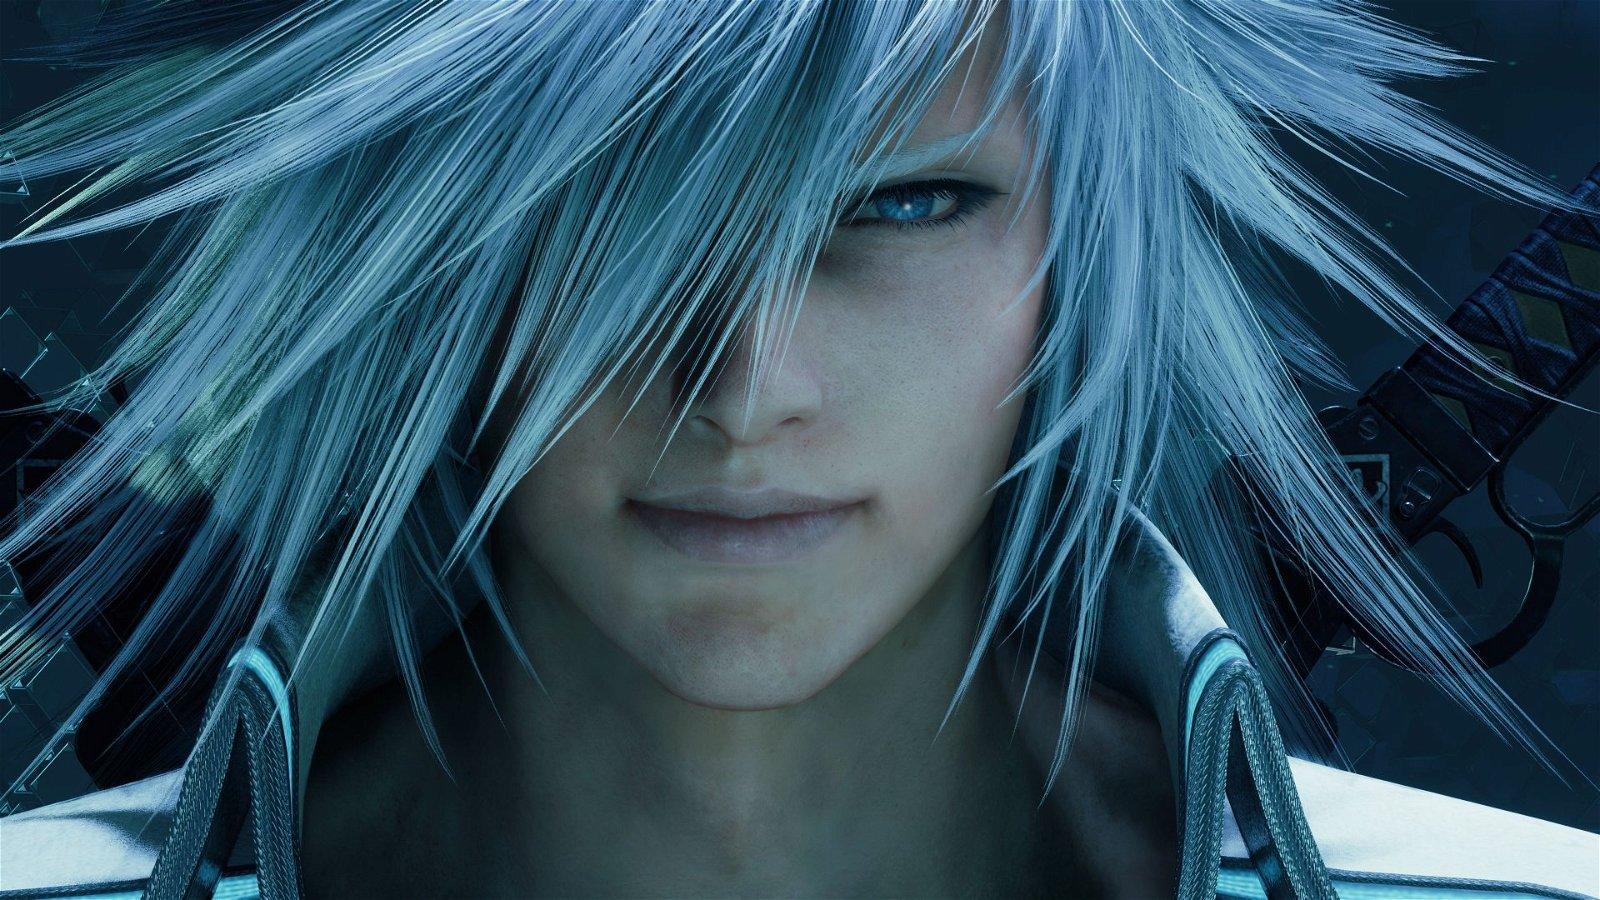 Final Fantasy VII Remake Intergrade: New Cast And Gameplay Details 1